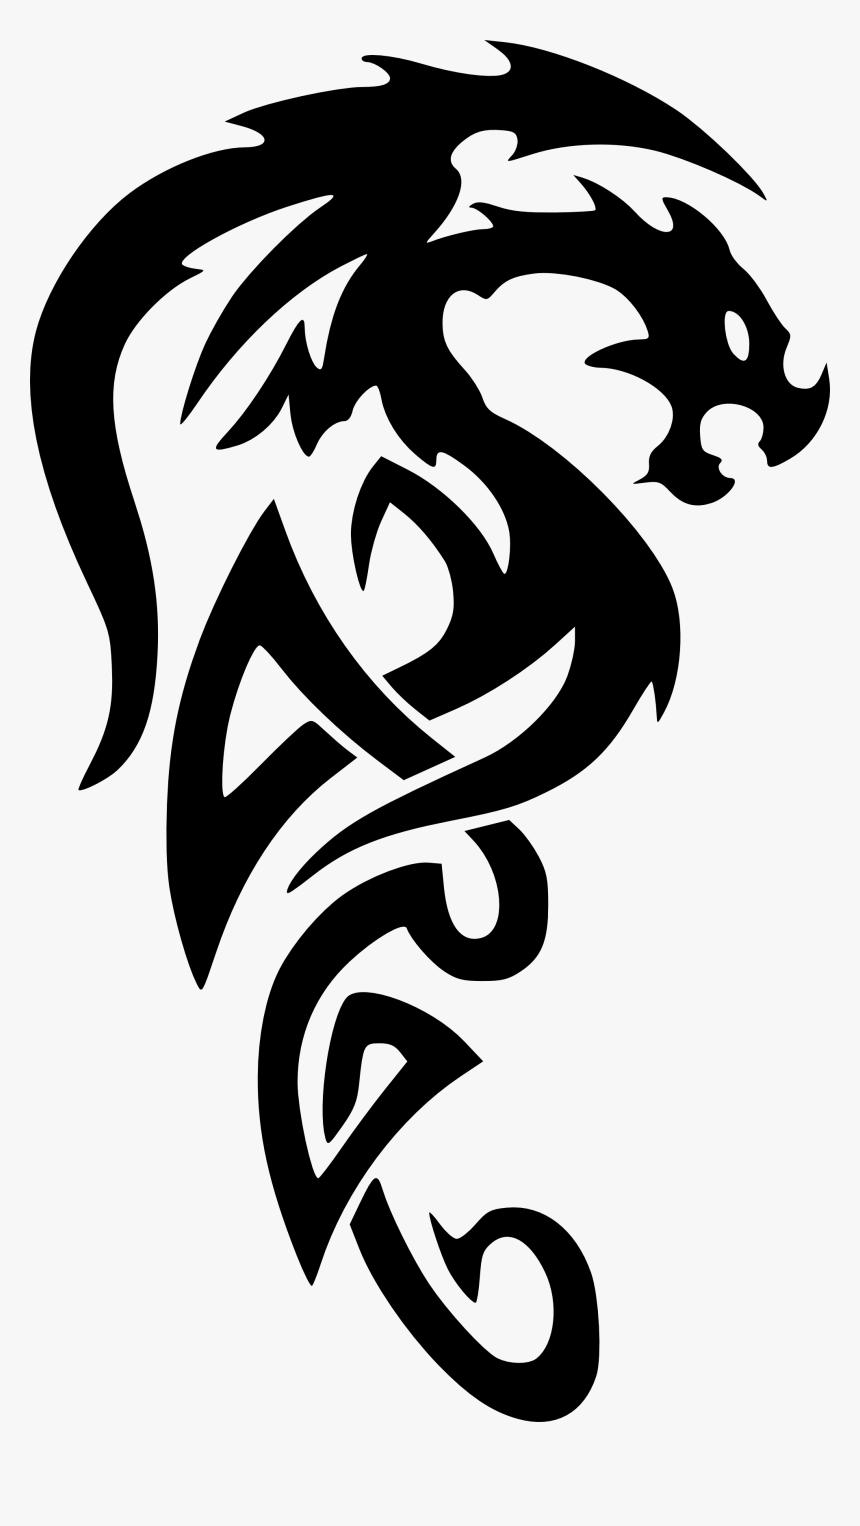 Transparent Tattoo Designs Png.